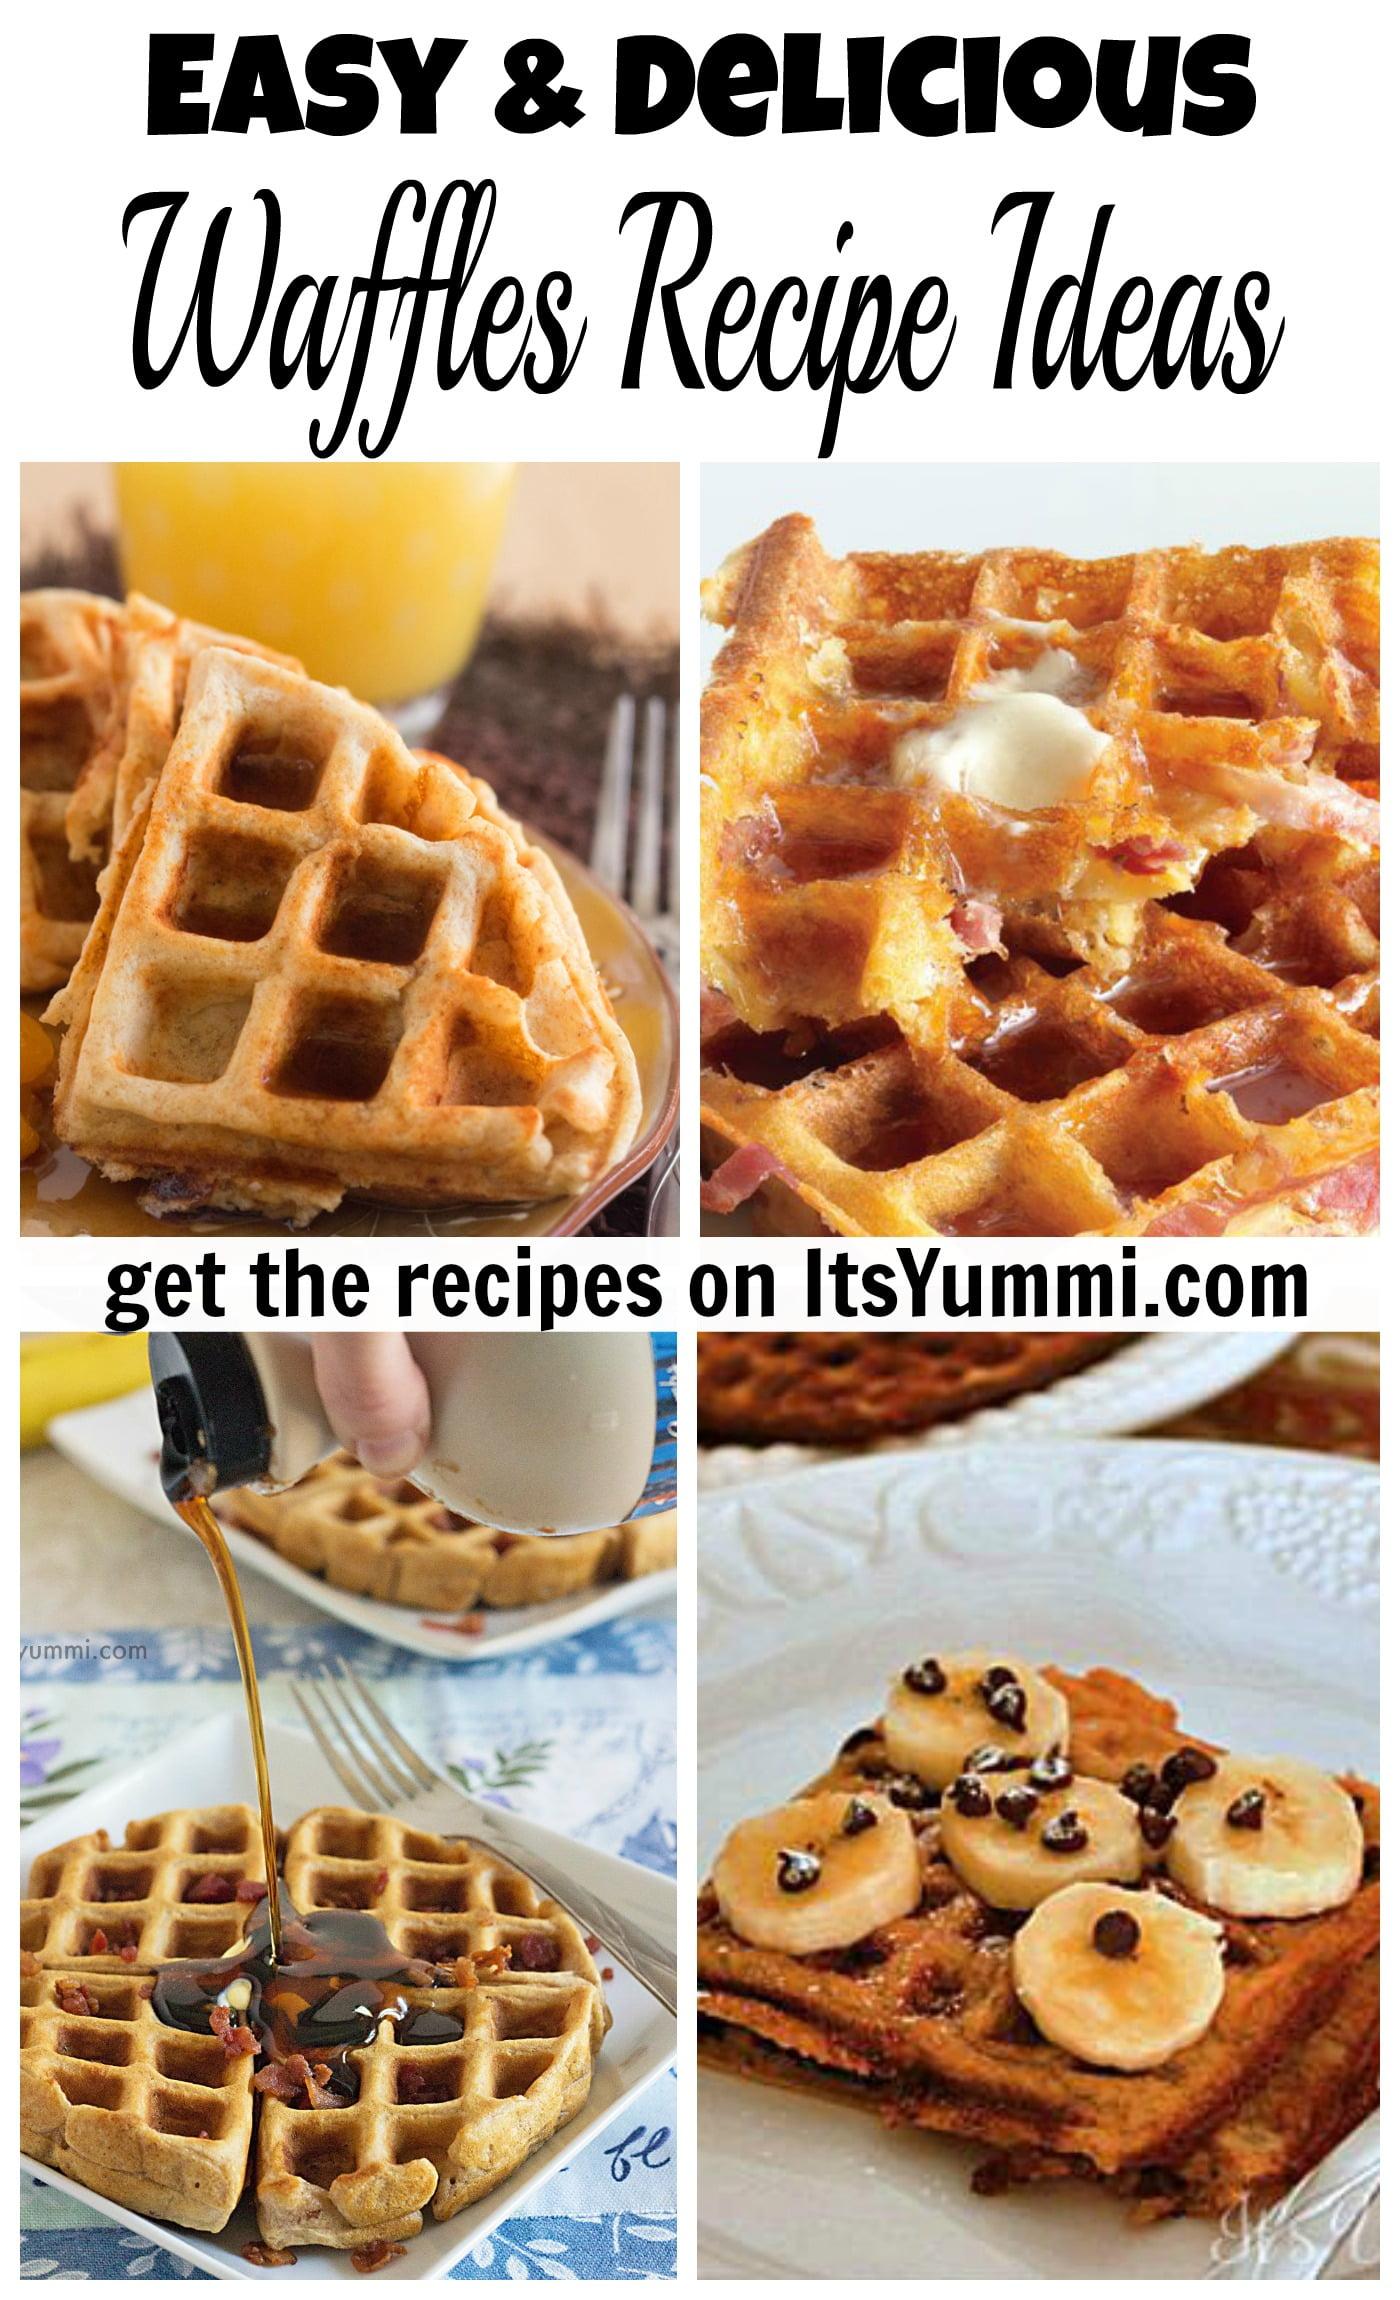 Easy Waffles Recipe Ideas ⋆ Its Yummi